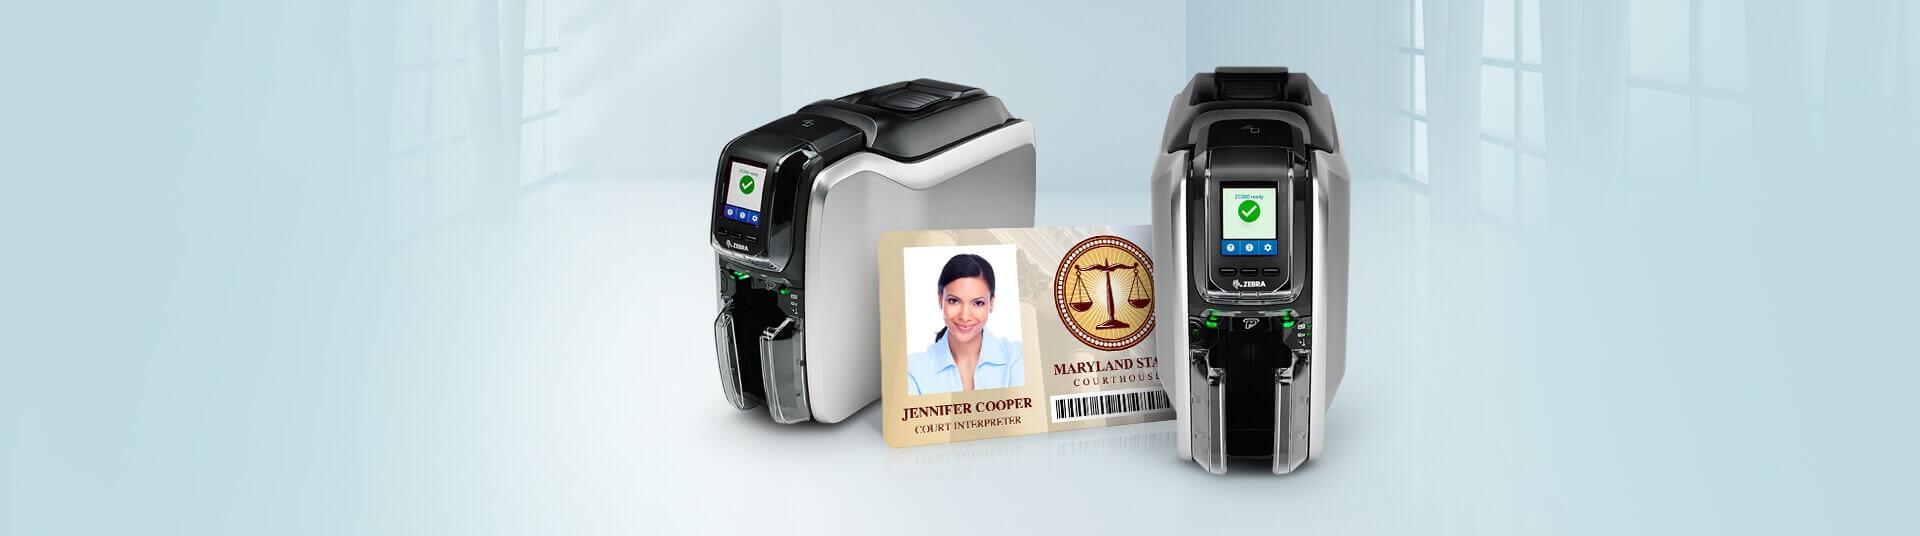 Zebra ZC300 ID Card Printers